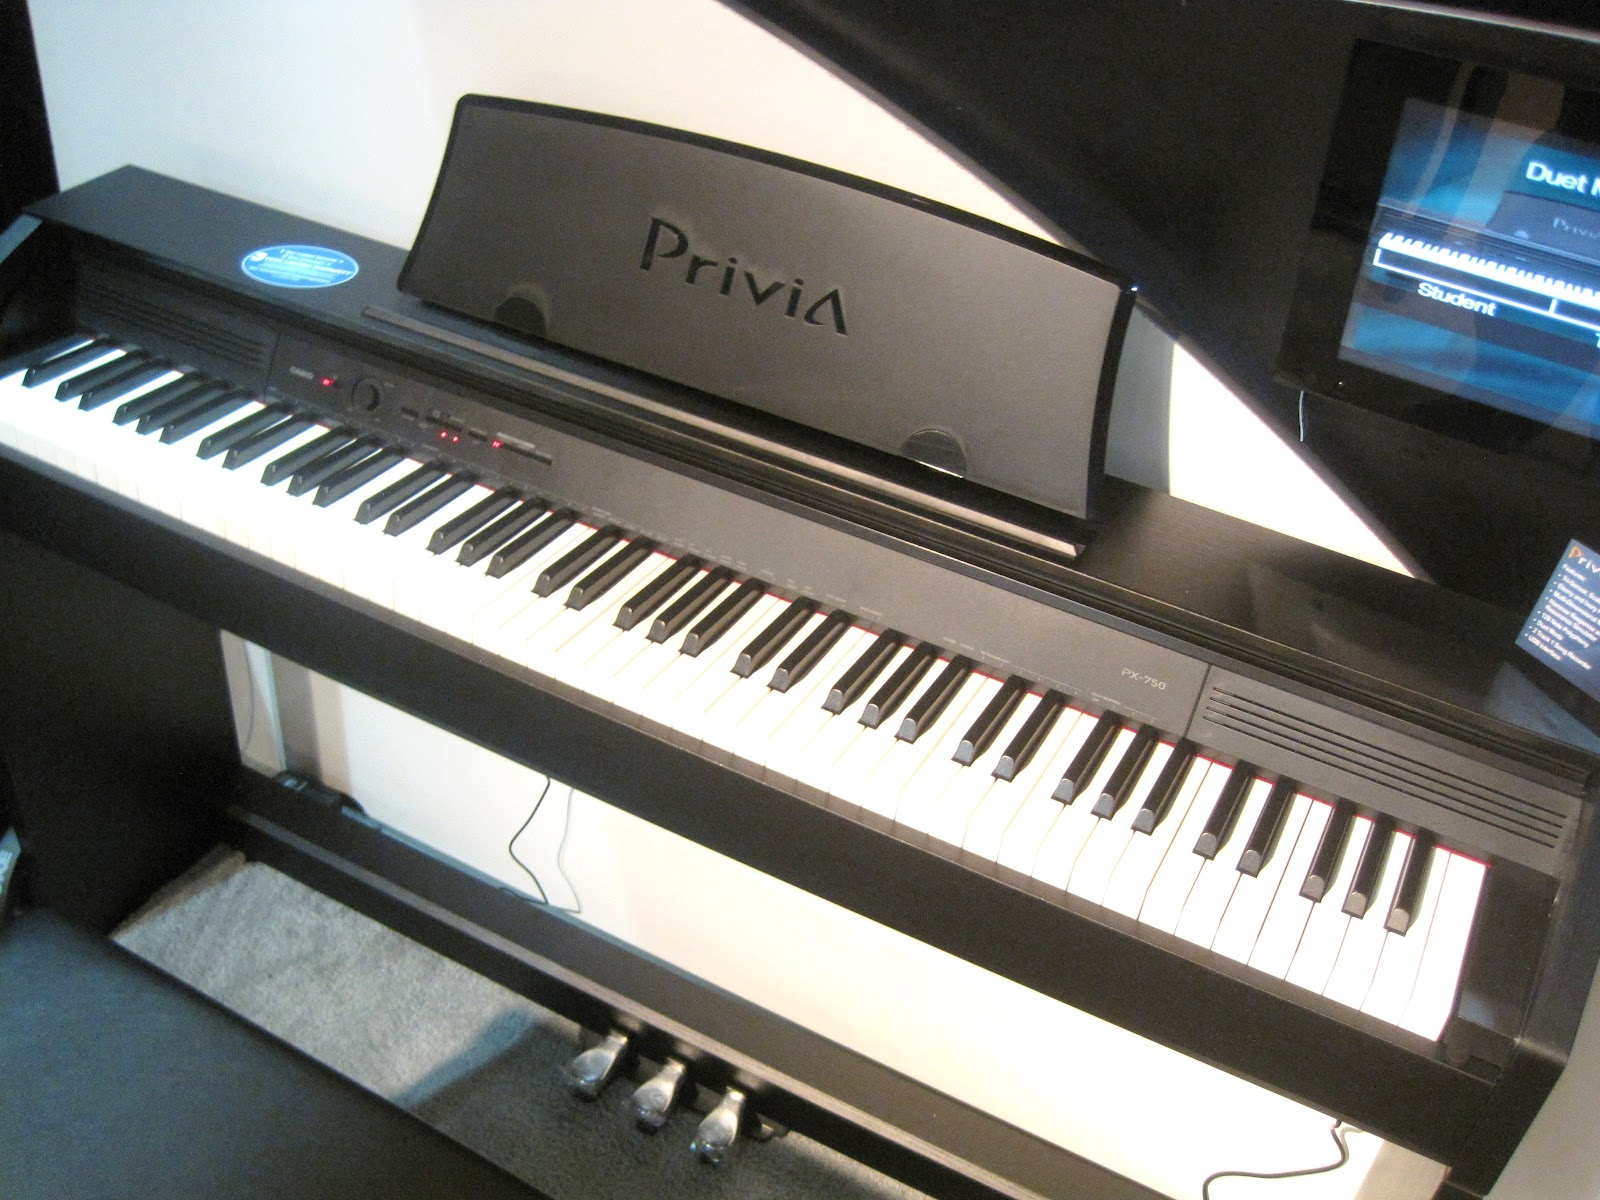 Keyboard Player Vs Digital Piano : az piano reviews digital keyboard vs digital piano review ~ Hamham.info Haus und Dekorationen